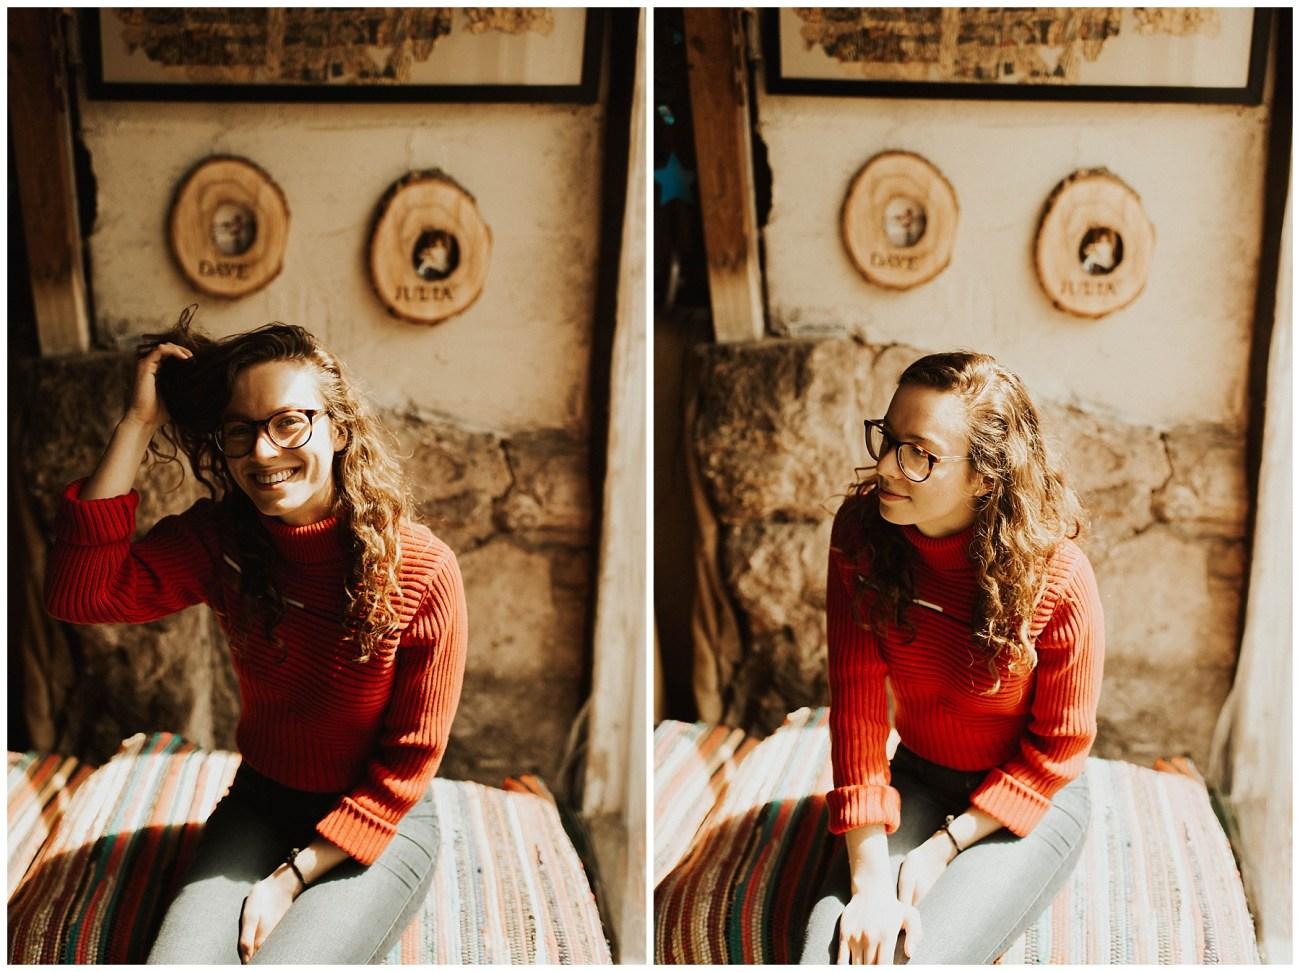 Sabrina    Candid Portraits – Lauren F.otography 3afed9d588c